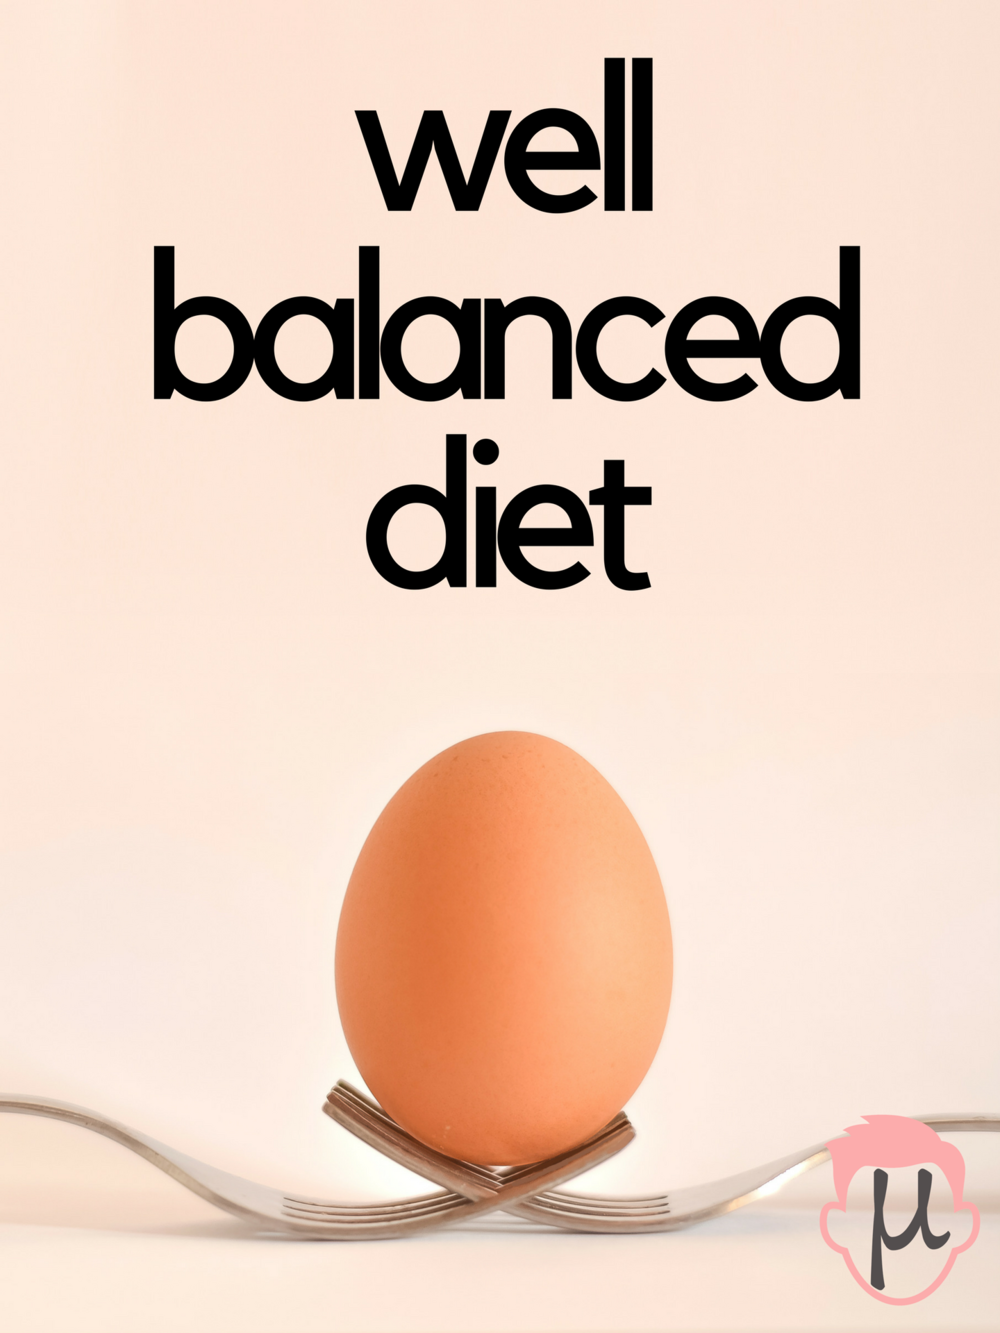 wellbalanceddiet.png